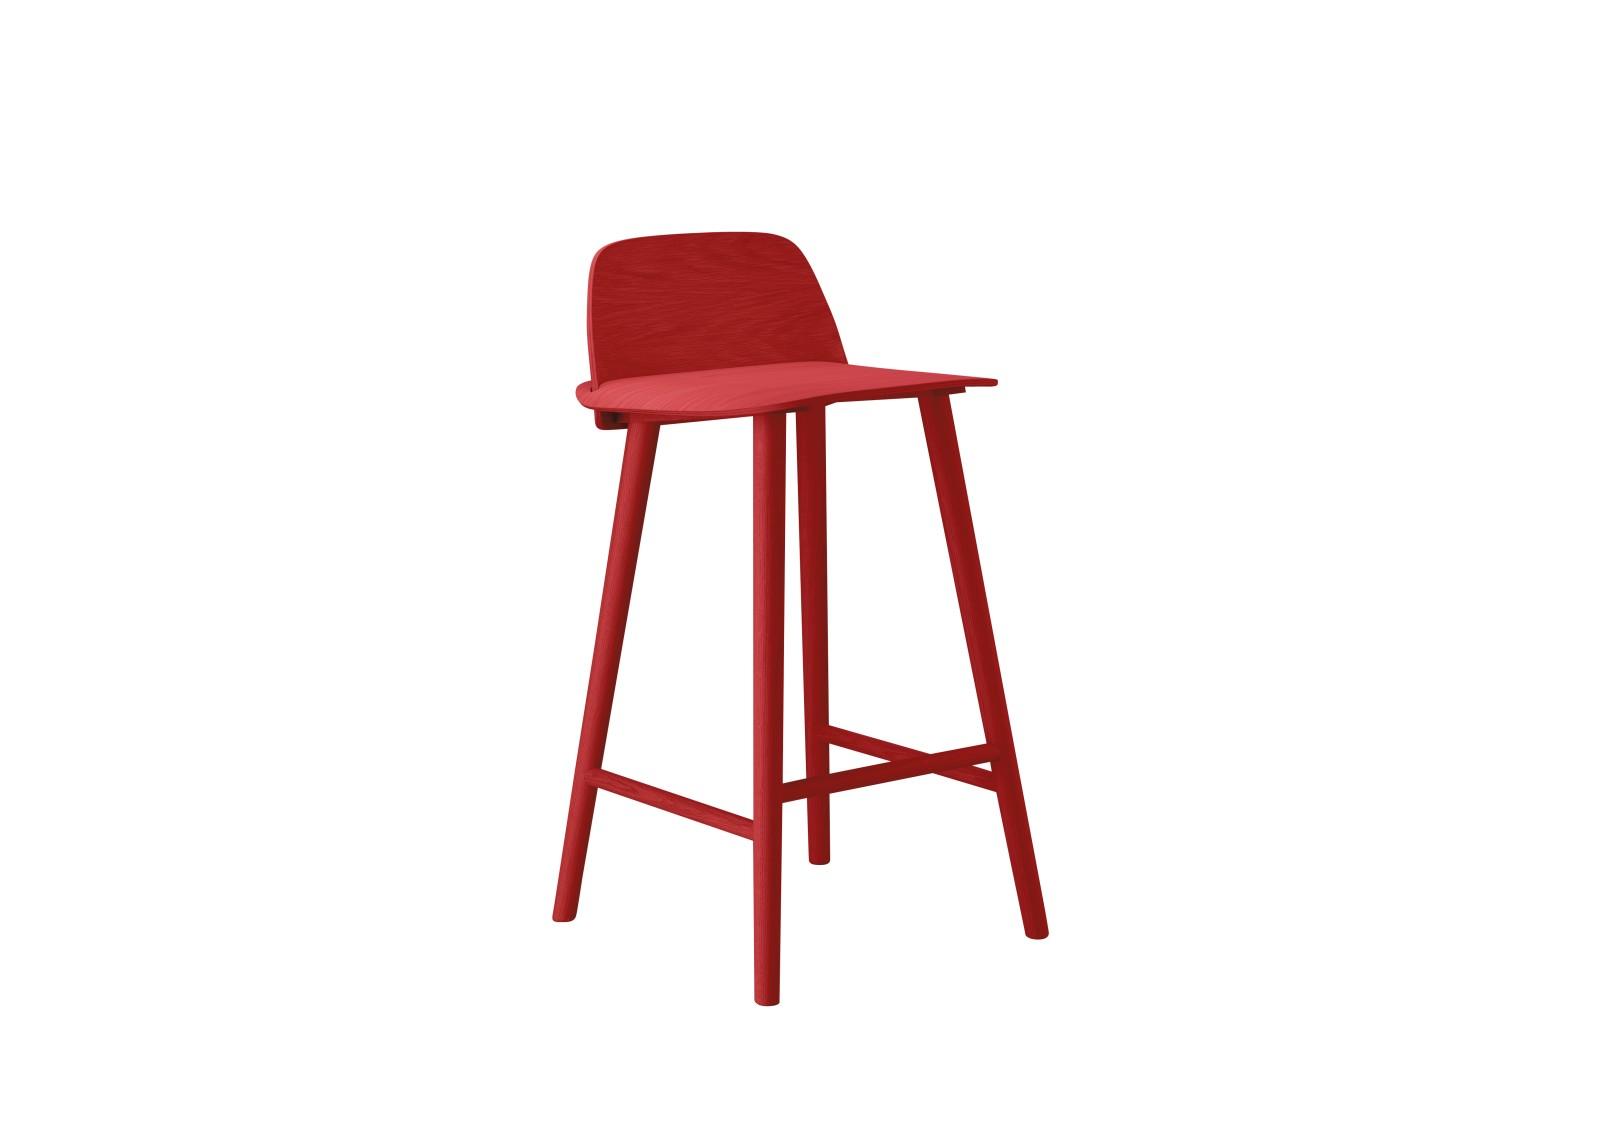 Nerd Bar Stool Red, 65cm